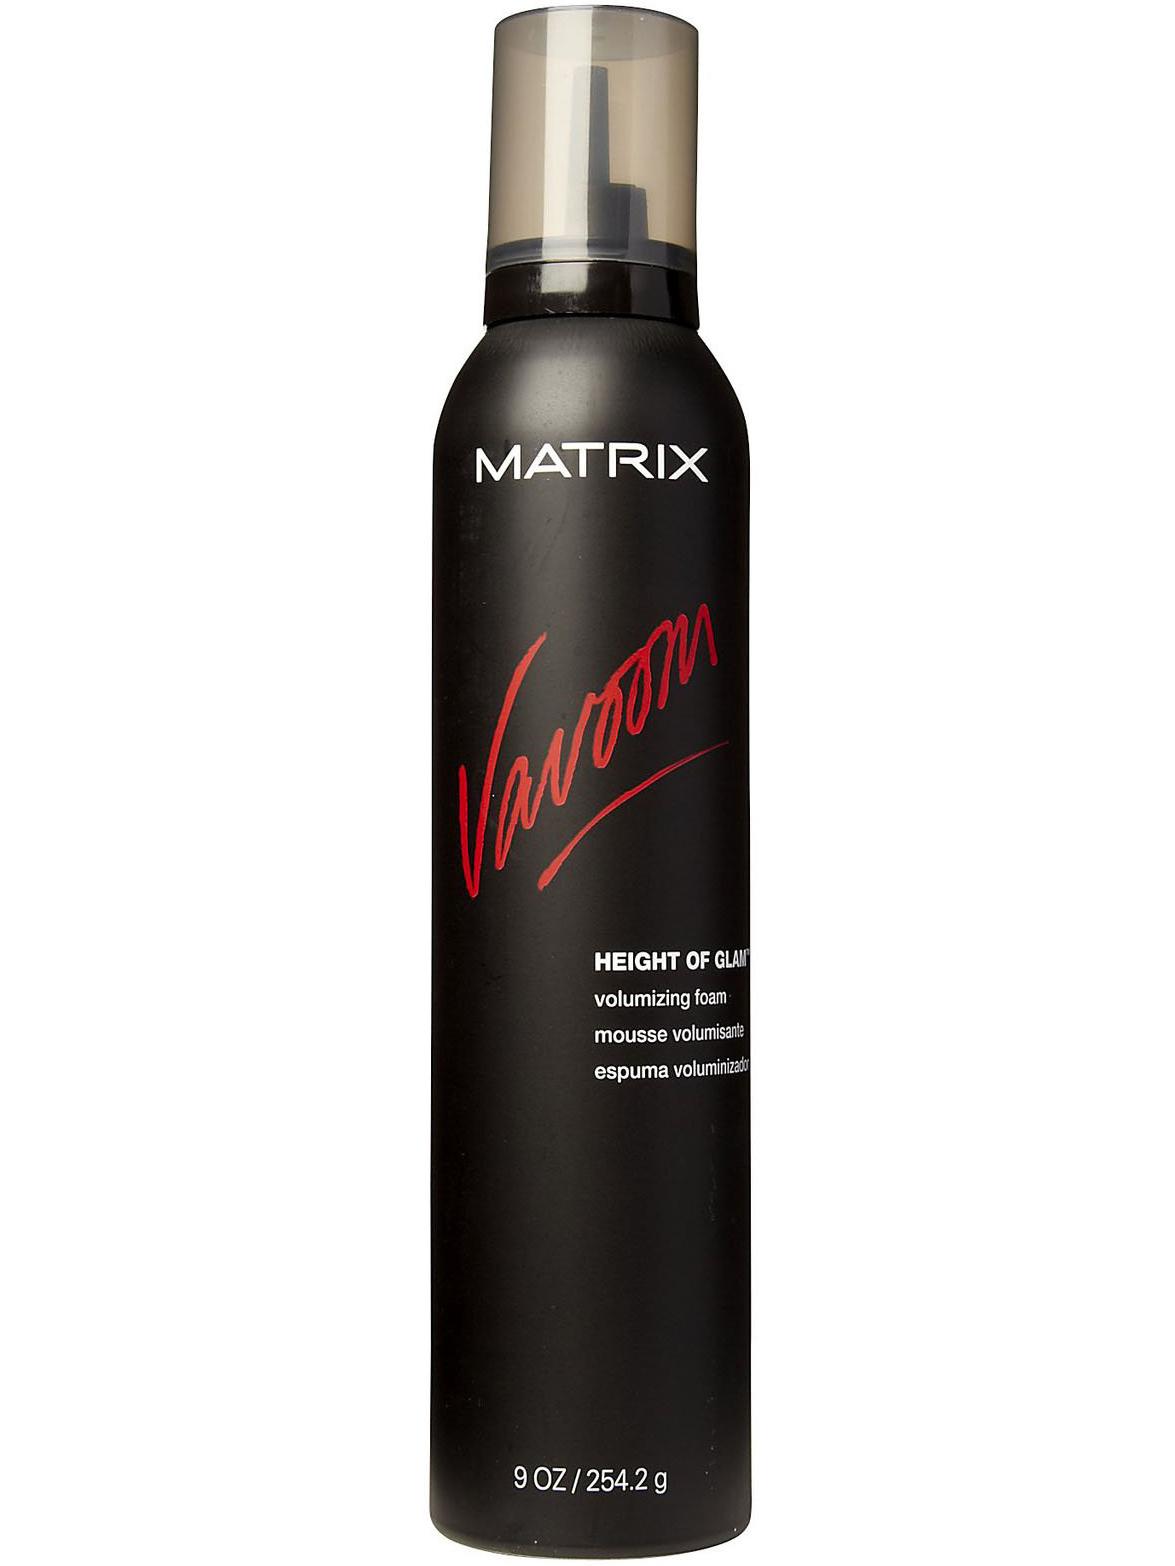 Matrix Вавум Мусс для объема HEIGHT OF GLAM 250 мл фото